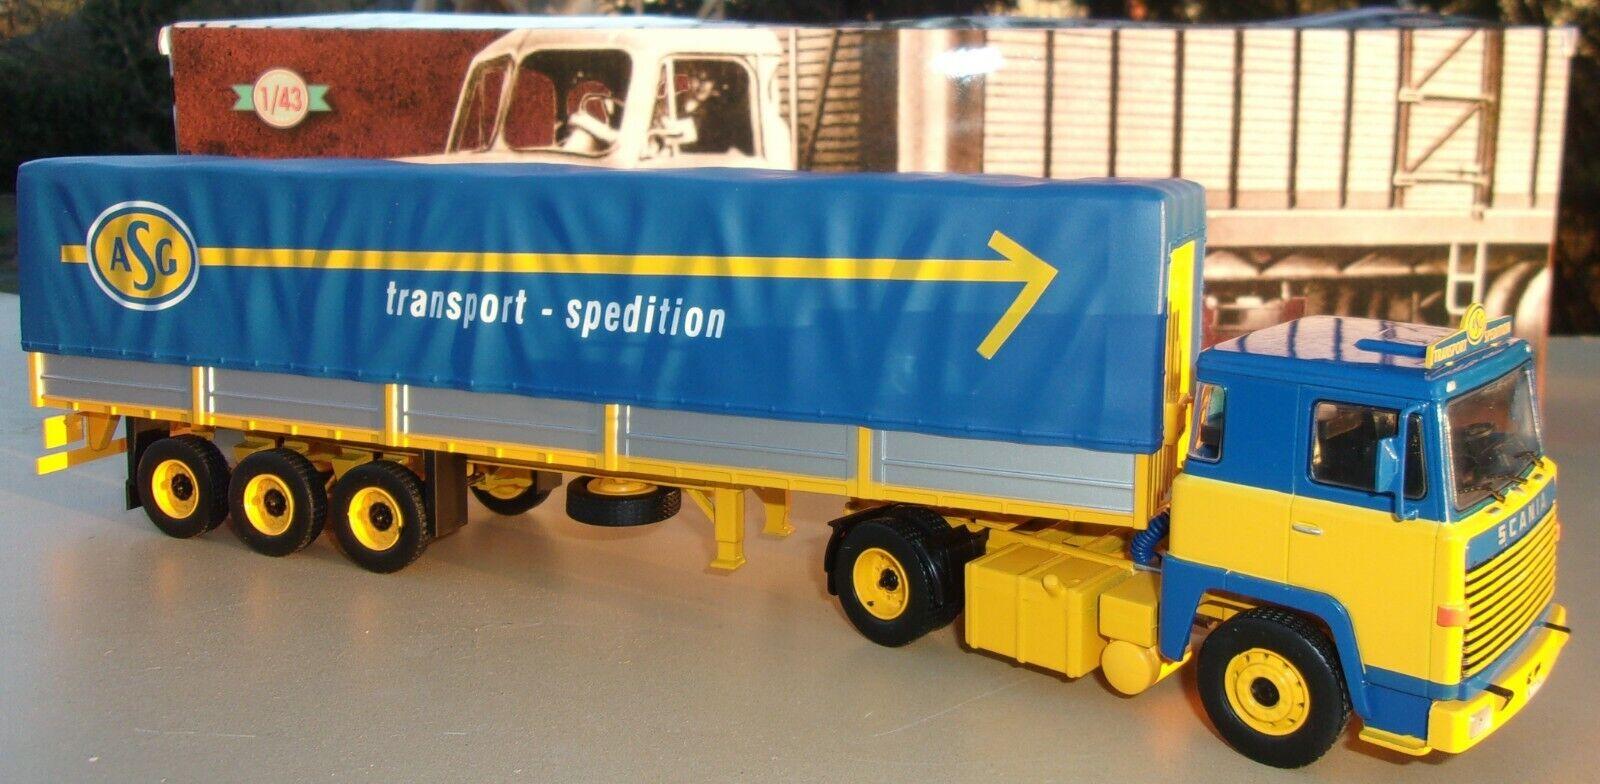 n° 78 SCANIA LBT 141 Camion Semi Remorque Transports ASG 1/43 Neuf en boite